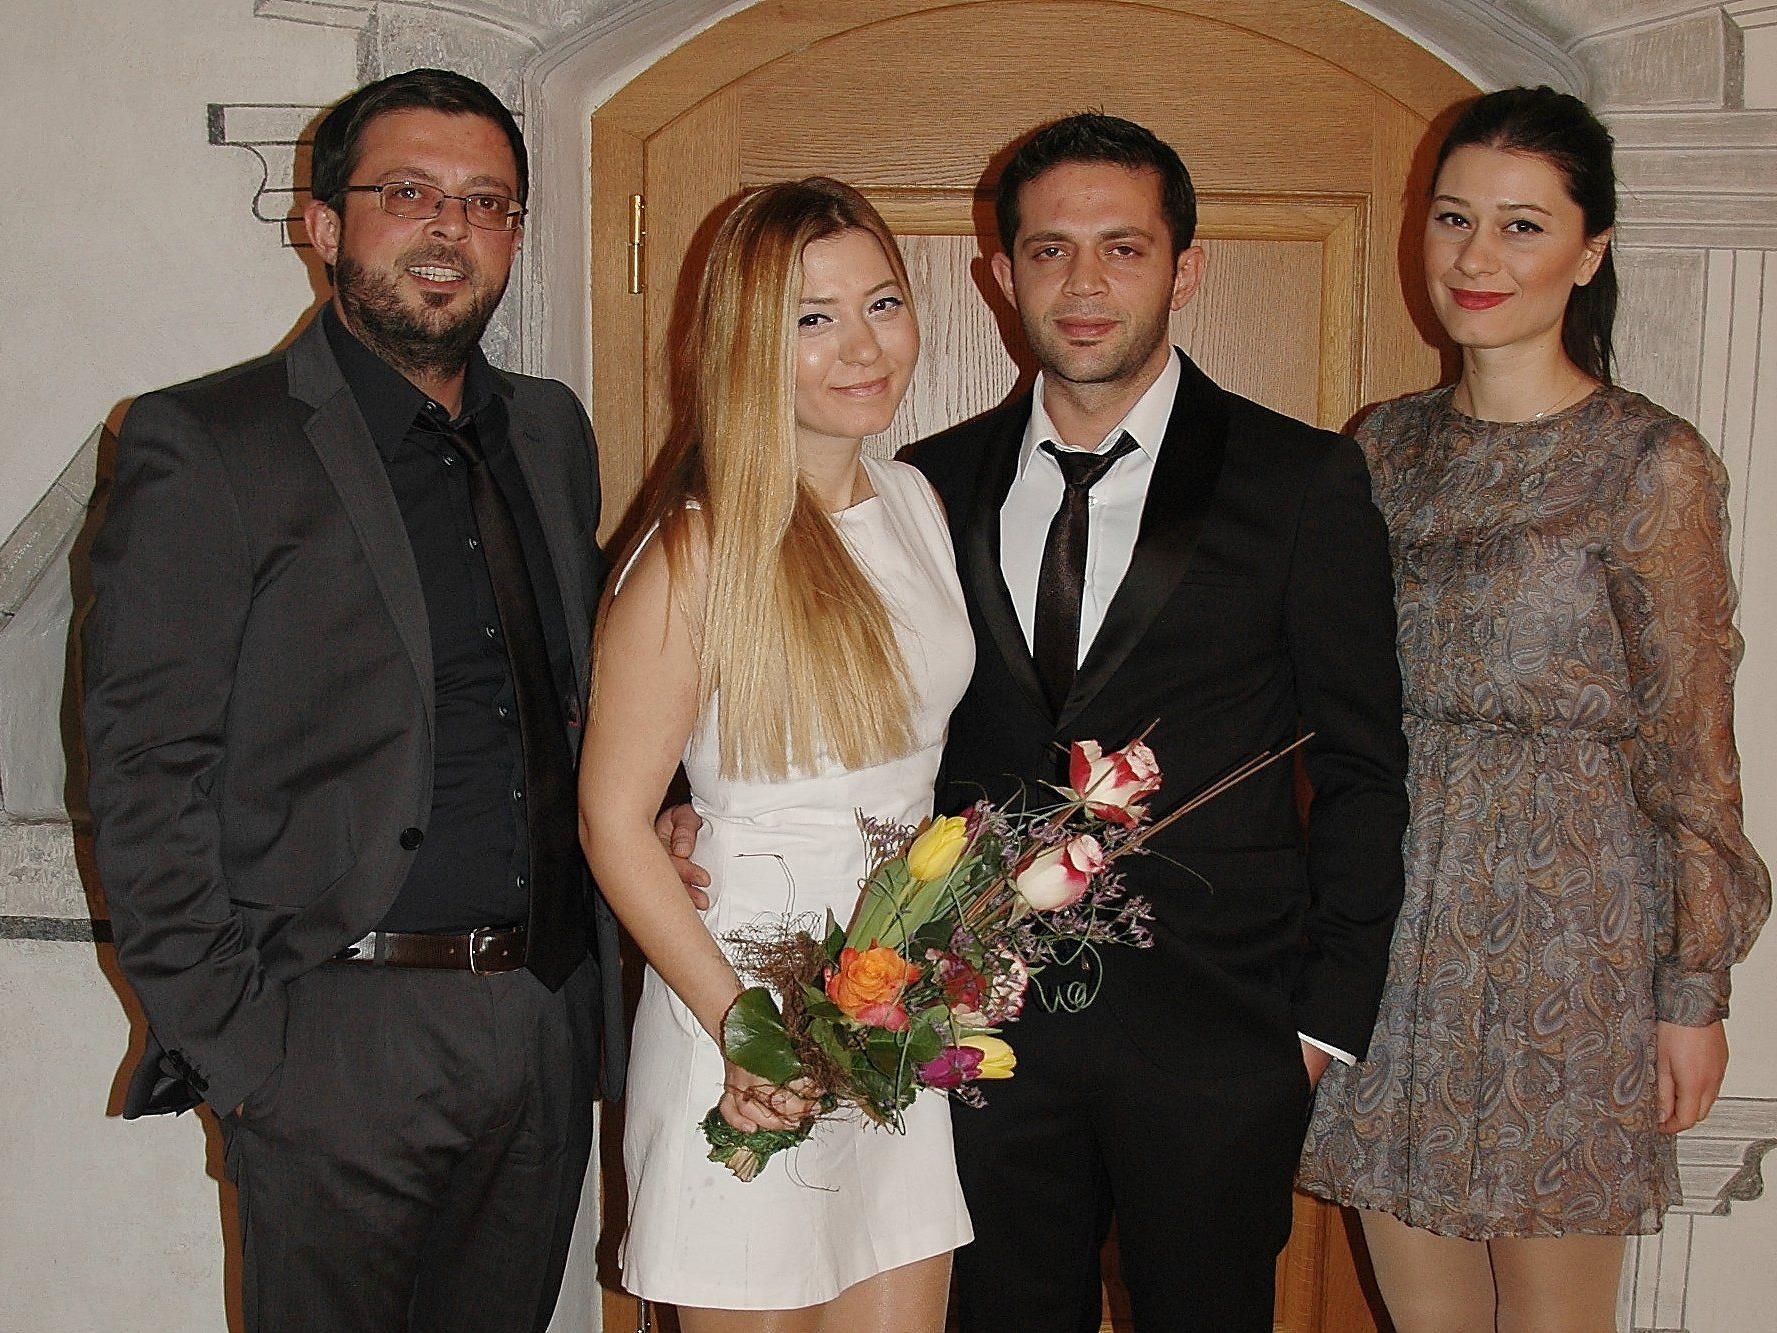 Melek Karabugday und Ibrahim Cakir haben geheiratet.